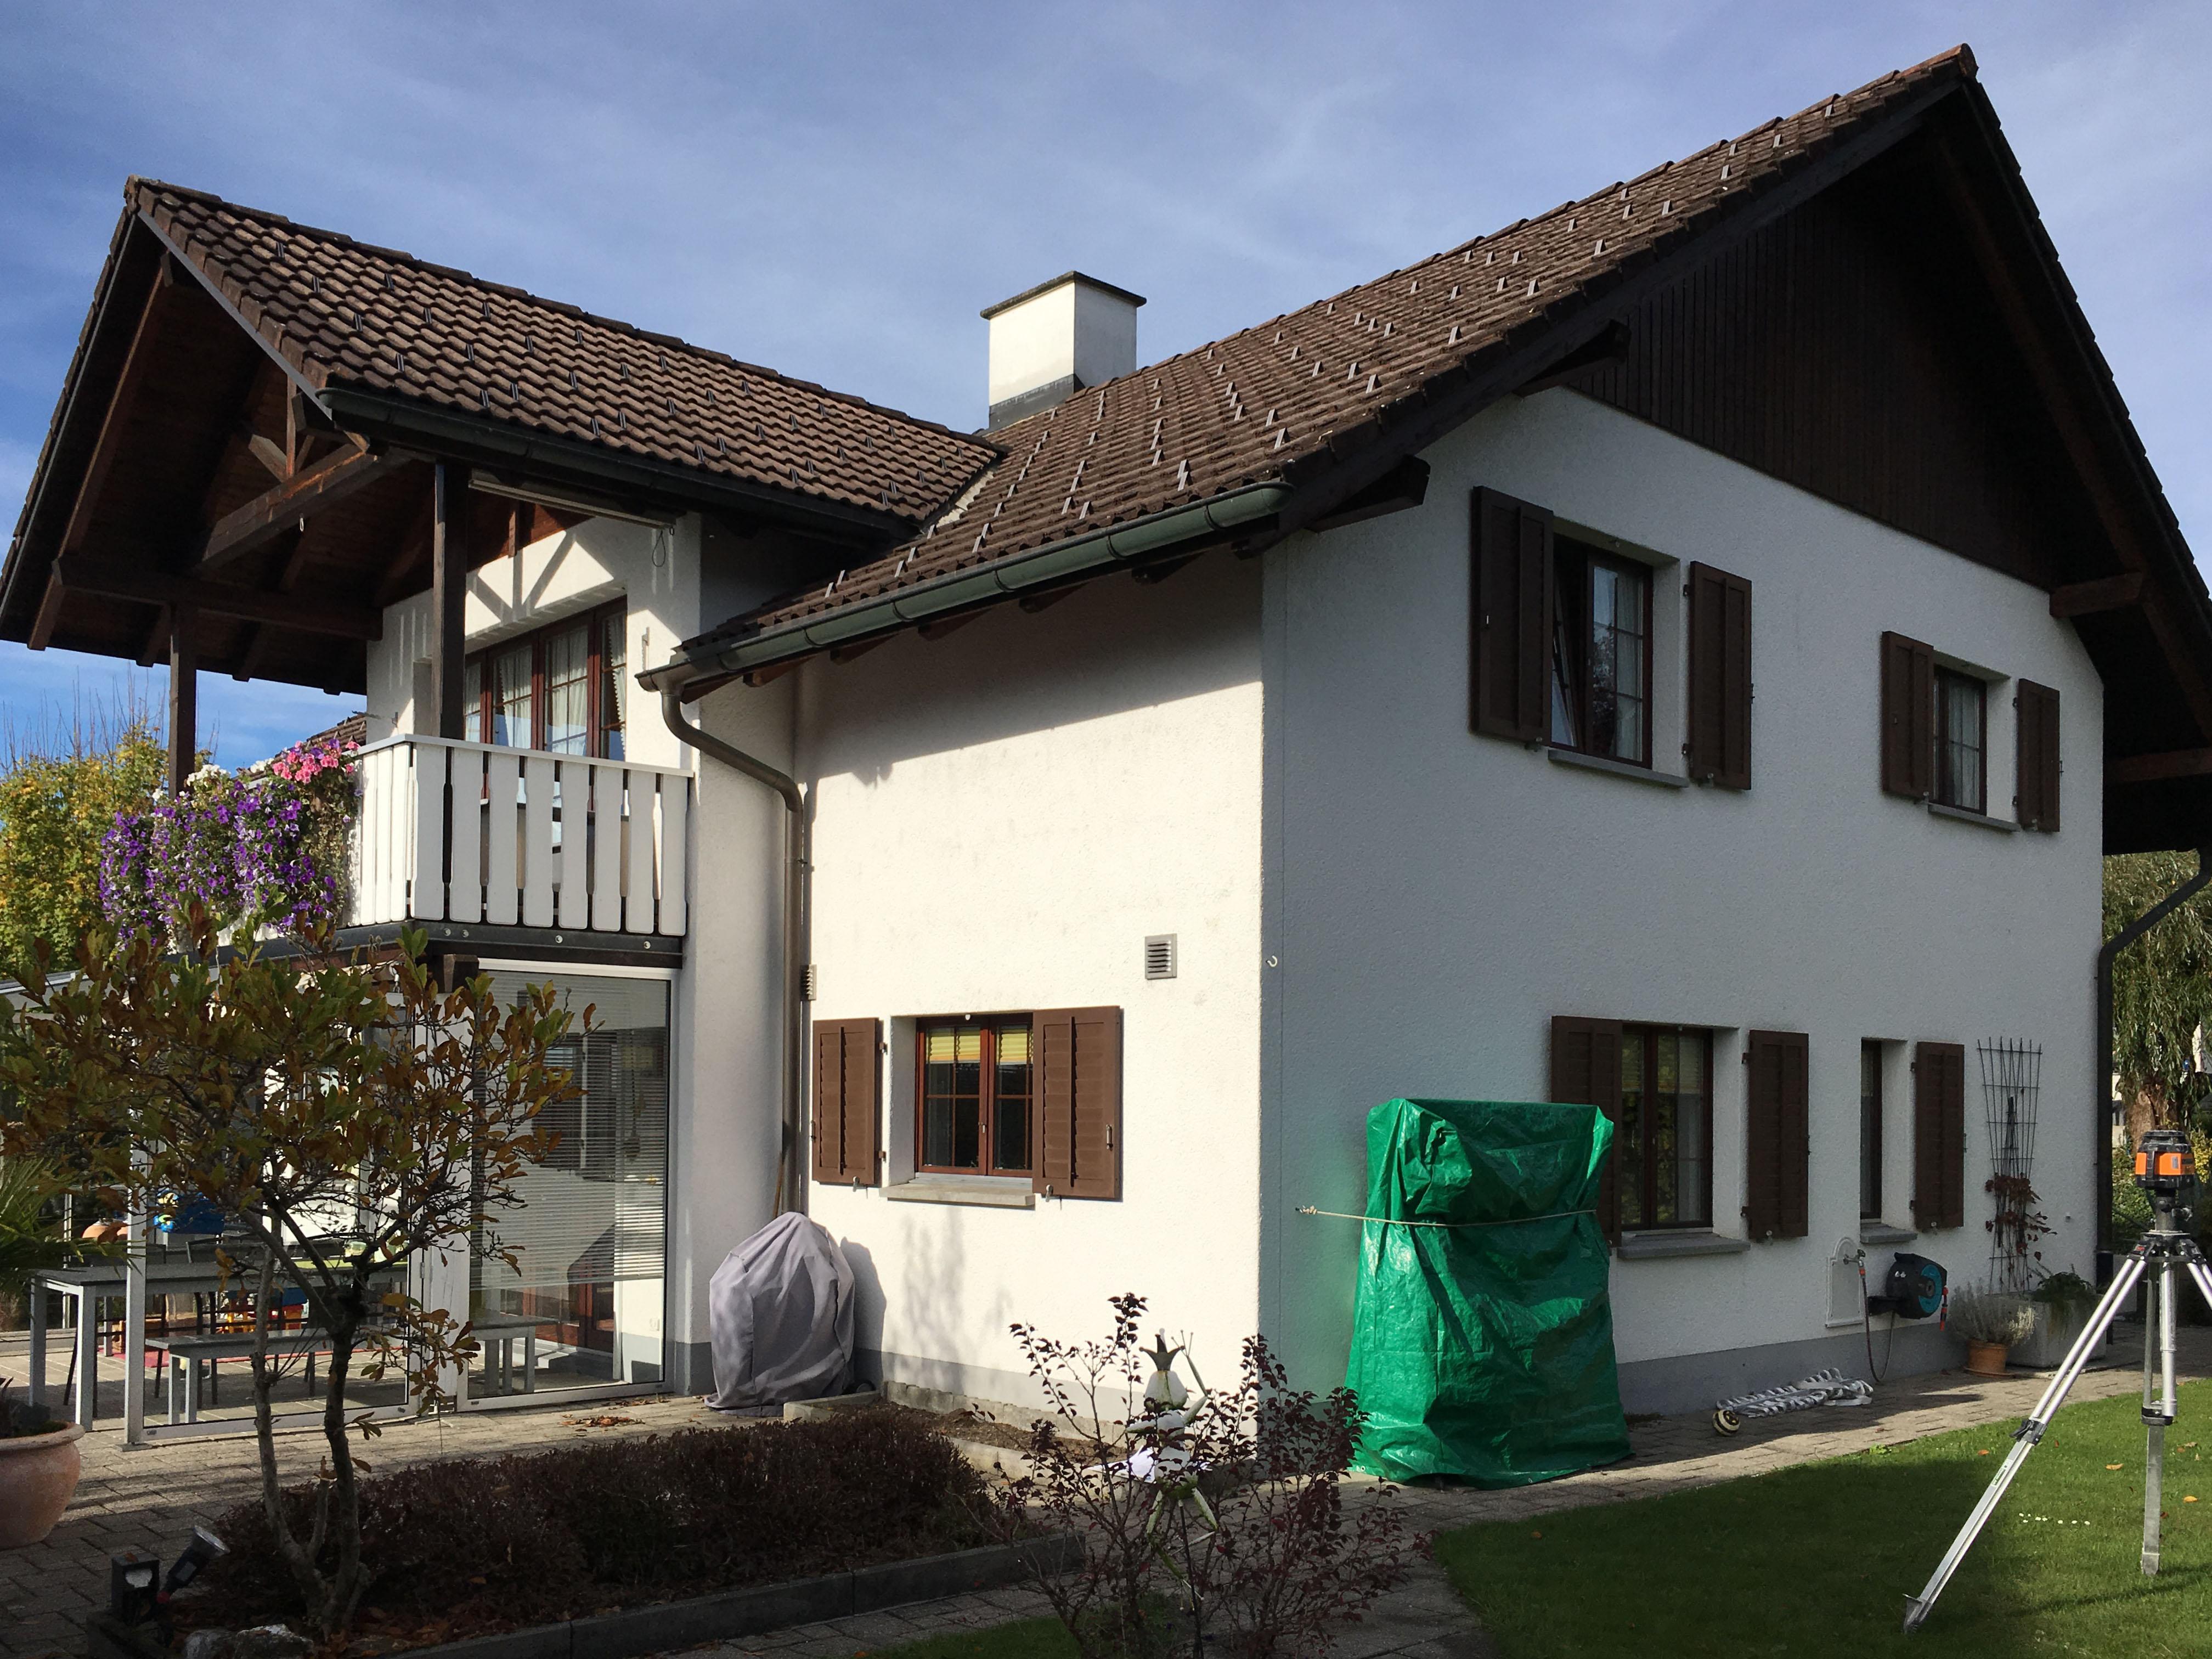 Ronner Neubau Ersatzbau Architektur Anbau Architketur achziger neunziger Nivelliergerät